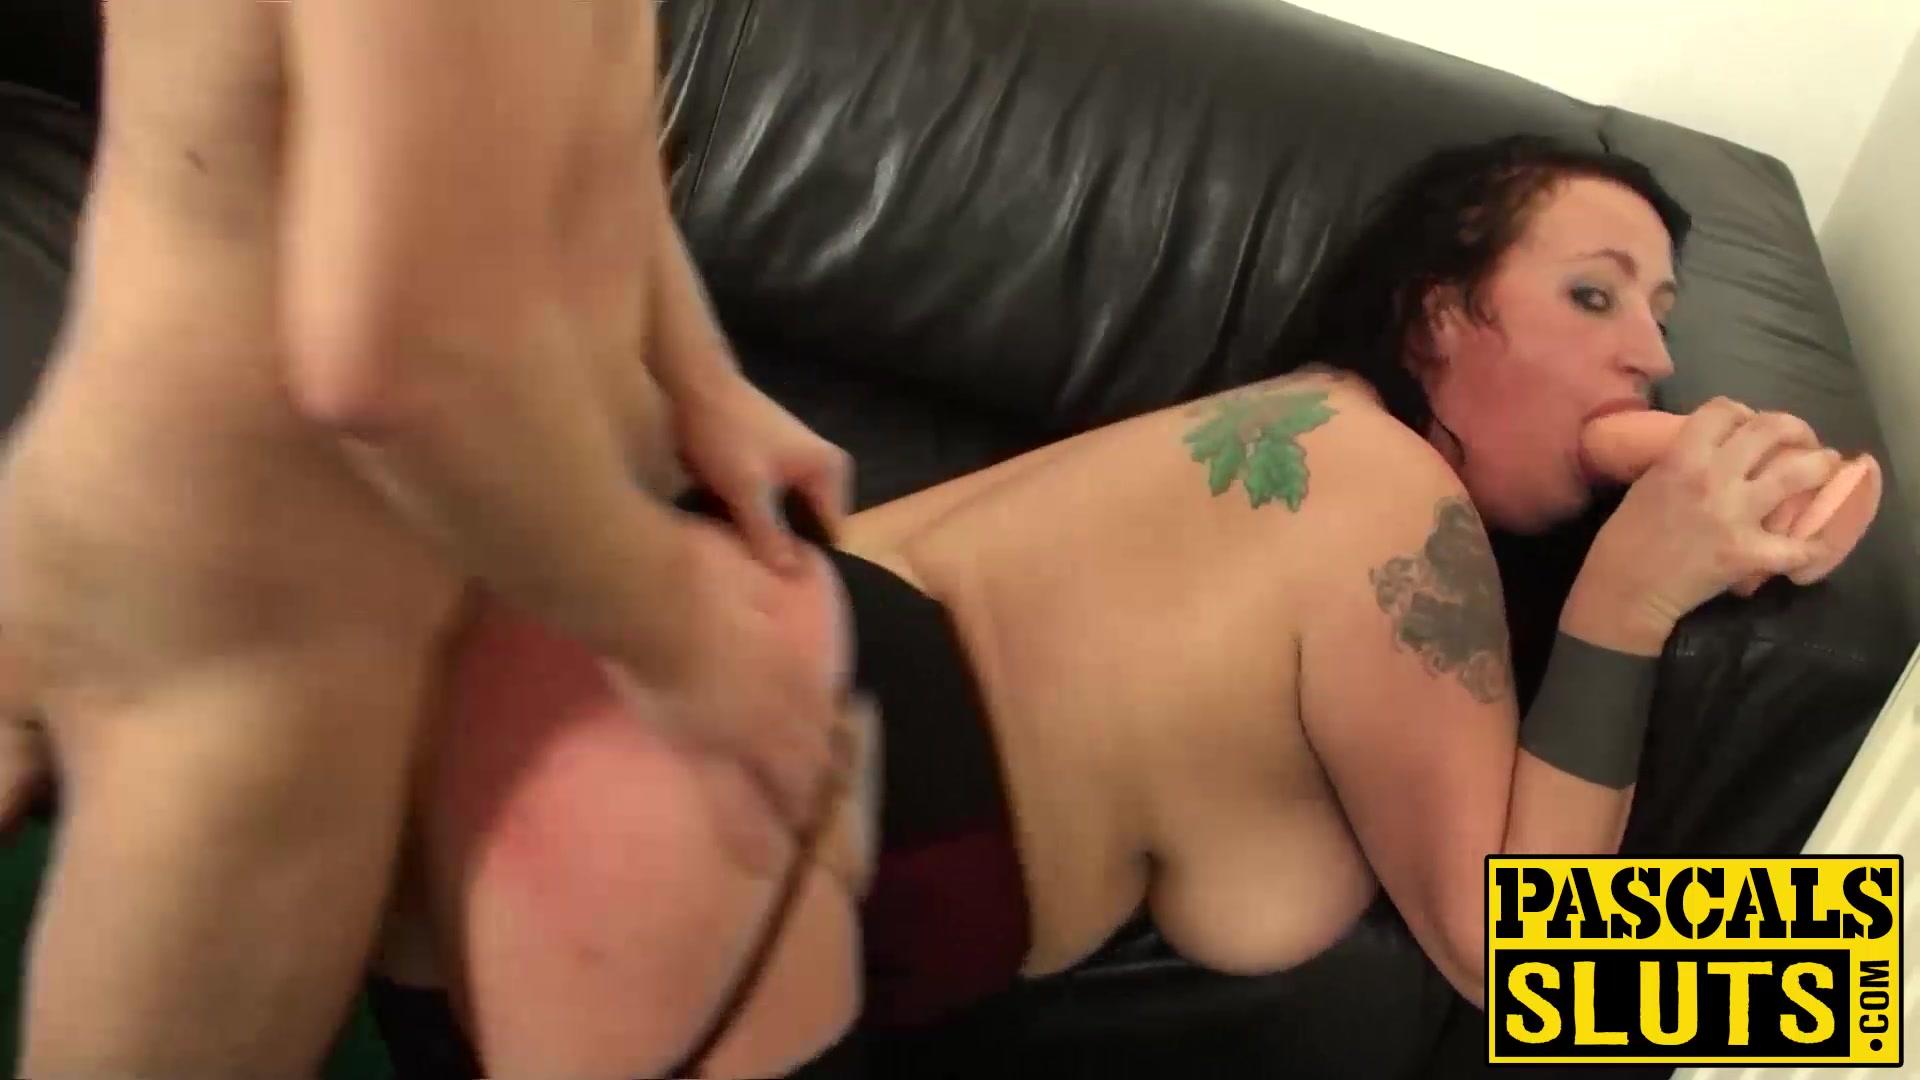 Hairy pussy landing strip women Naked xXx Base pics